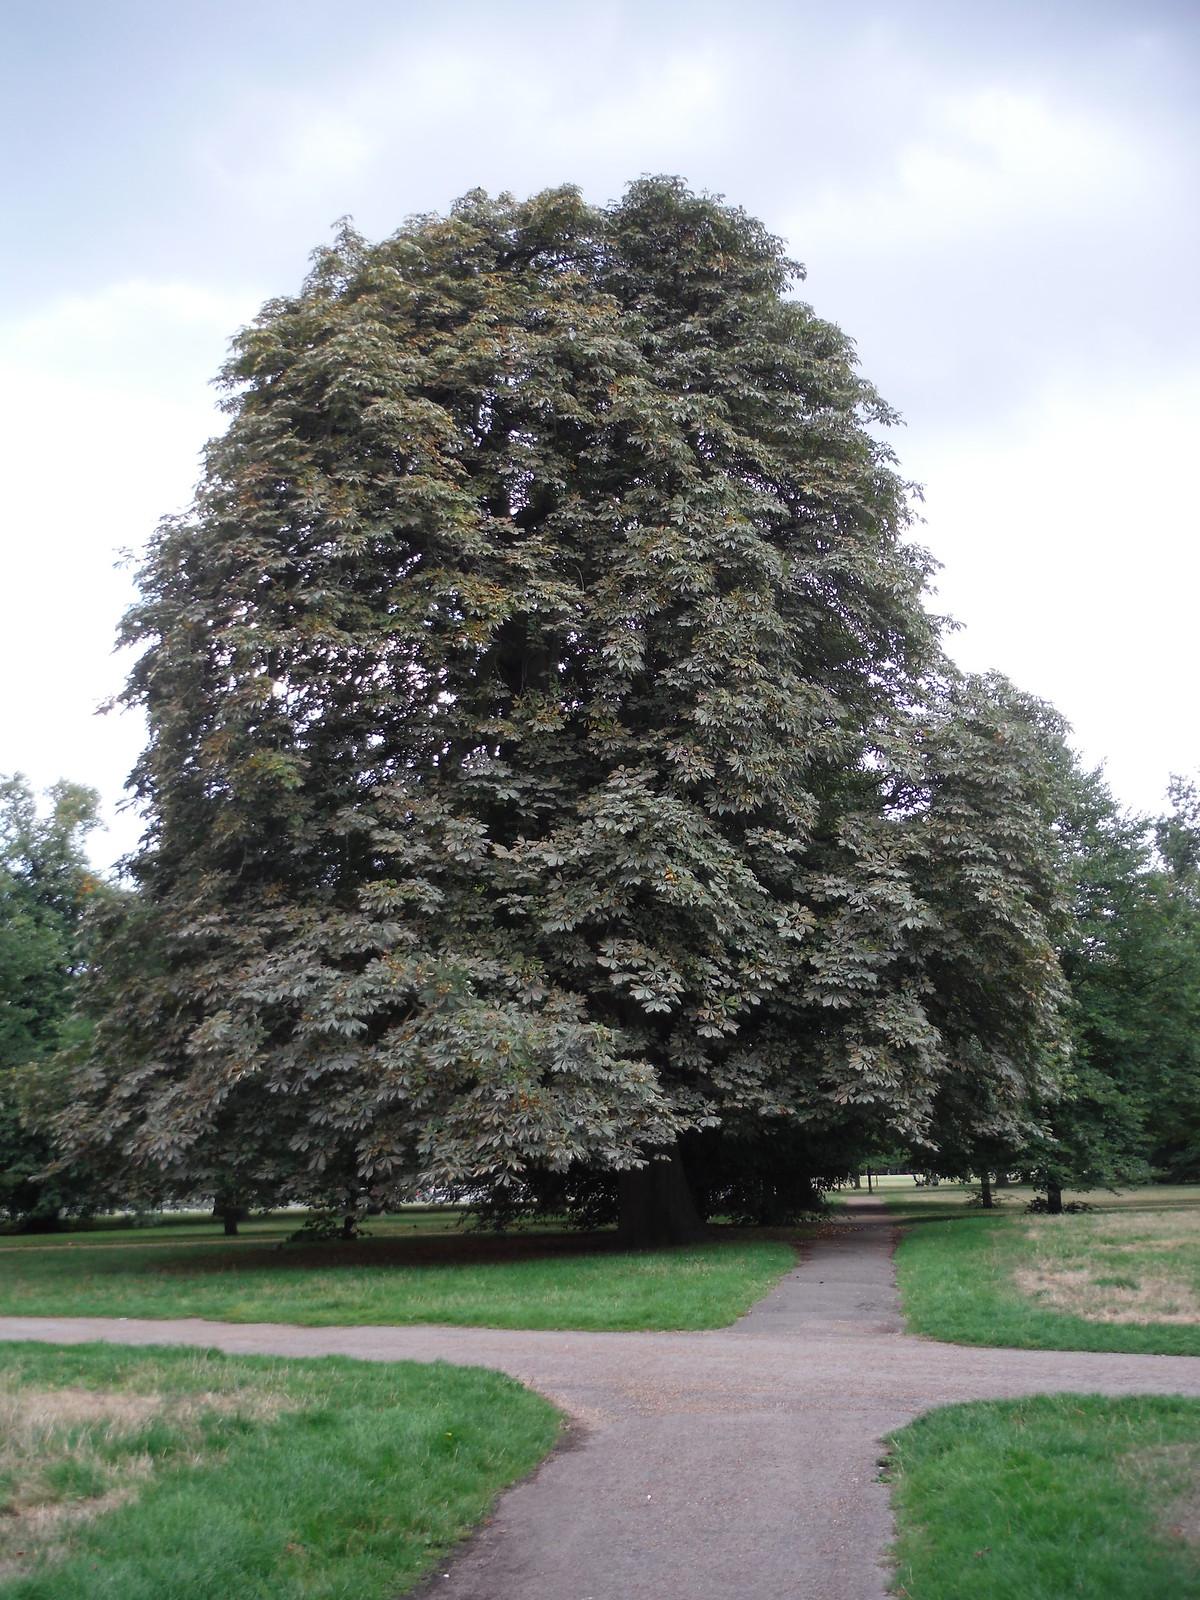 Big Tree, Kensington Gardens SWC Short Walk 19 - Royal Parks